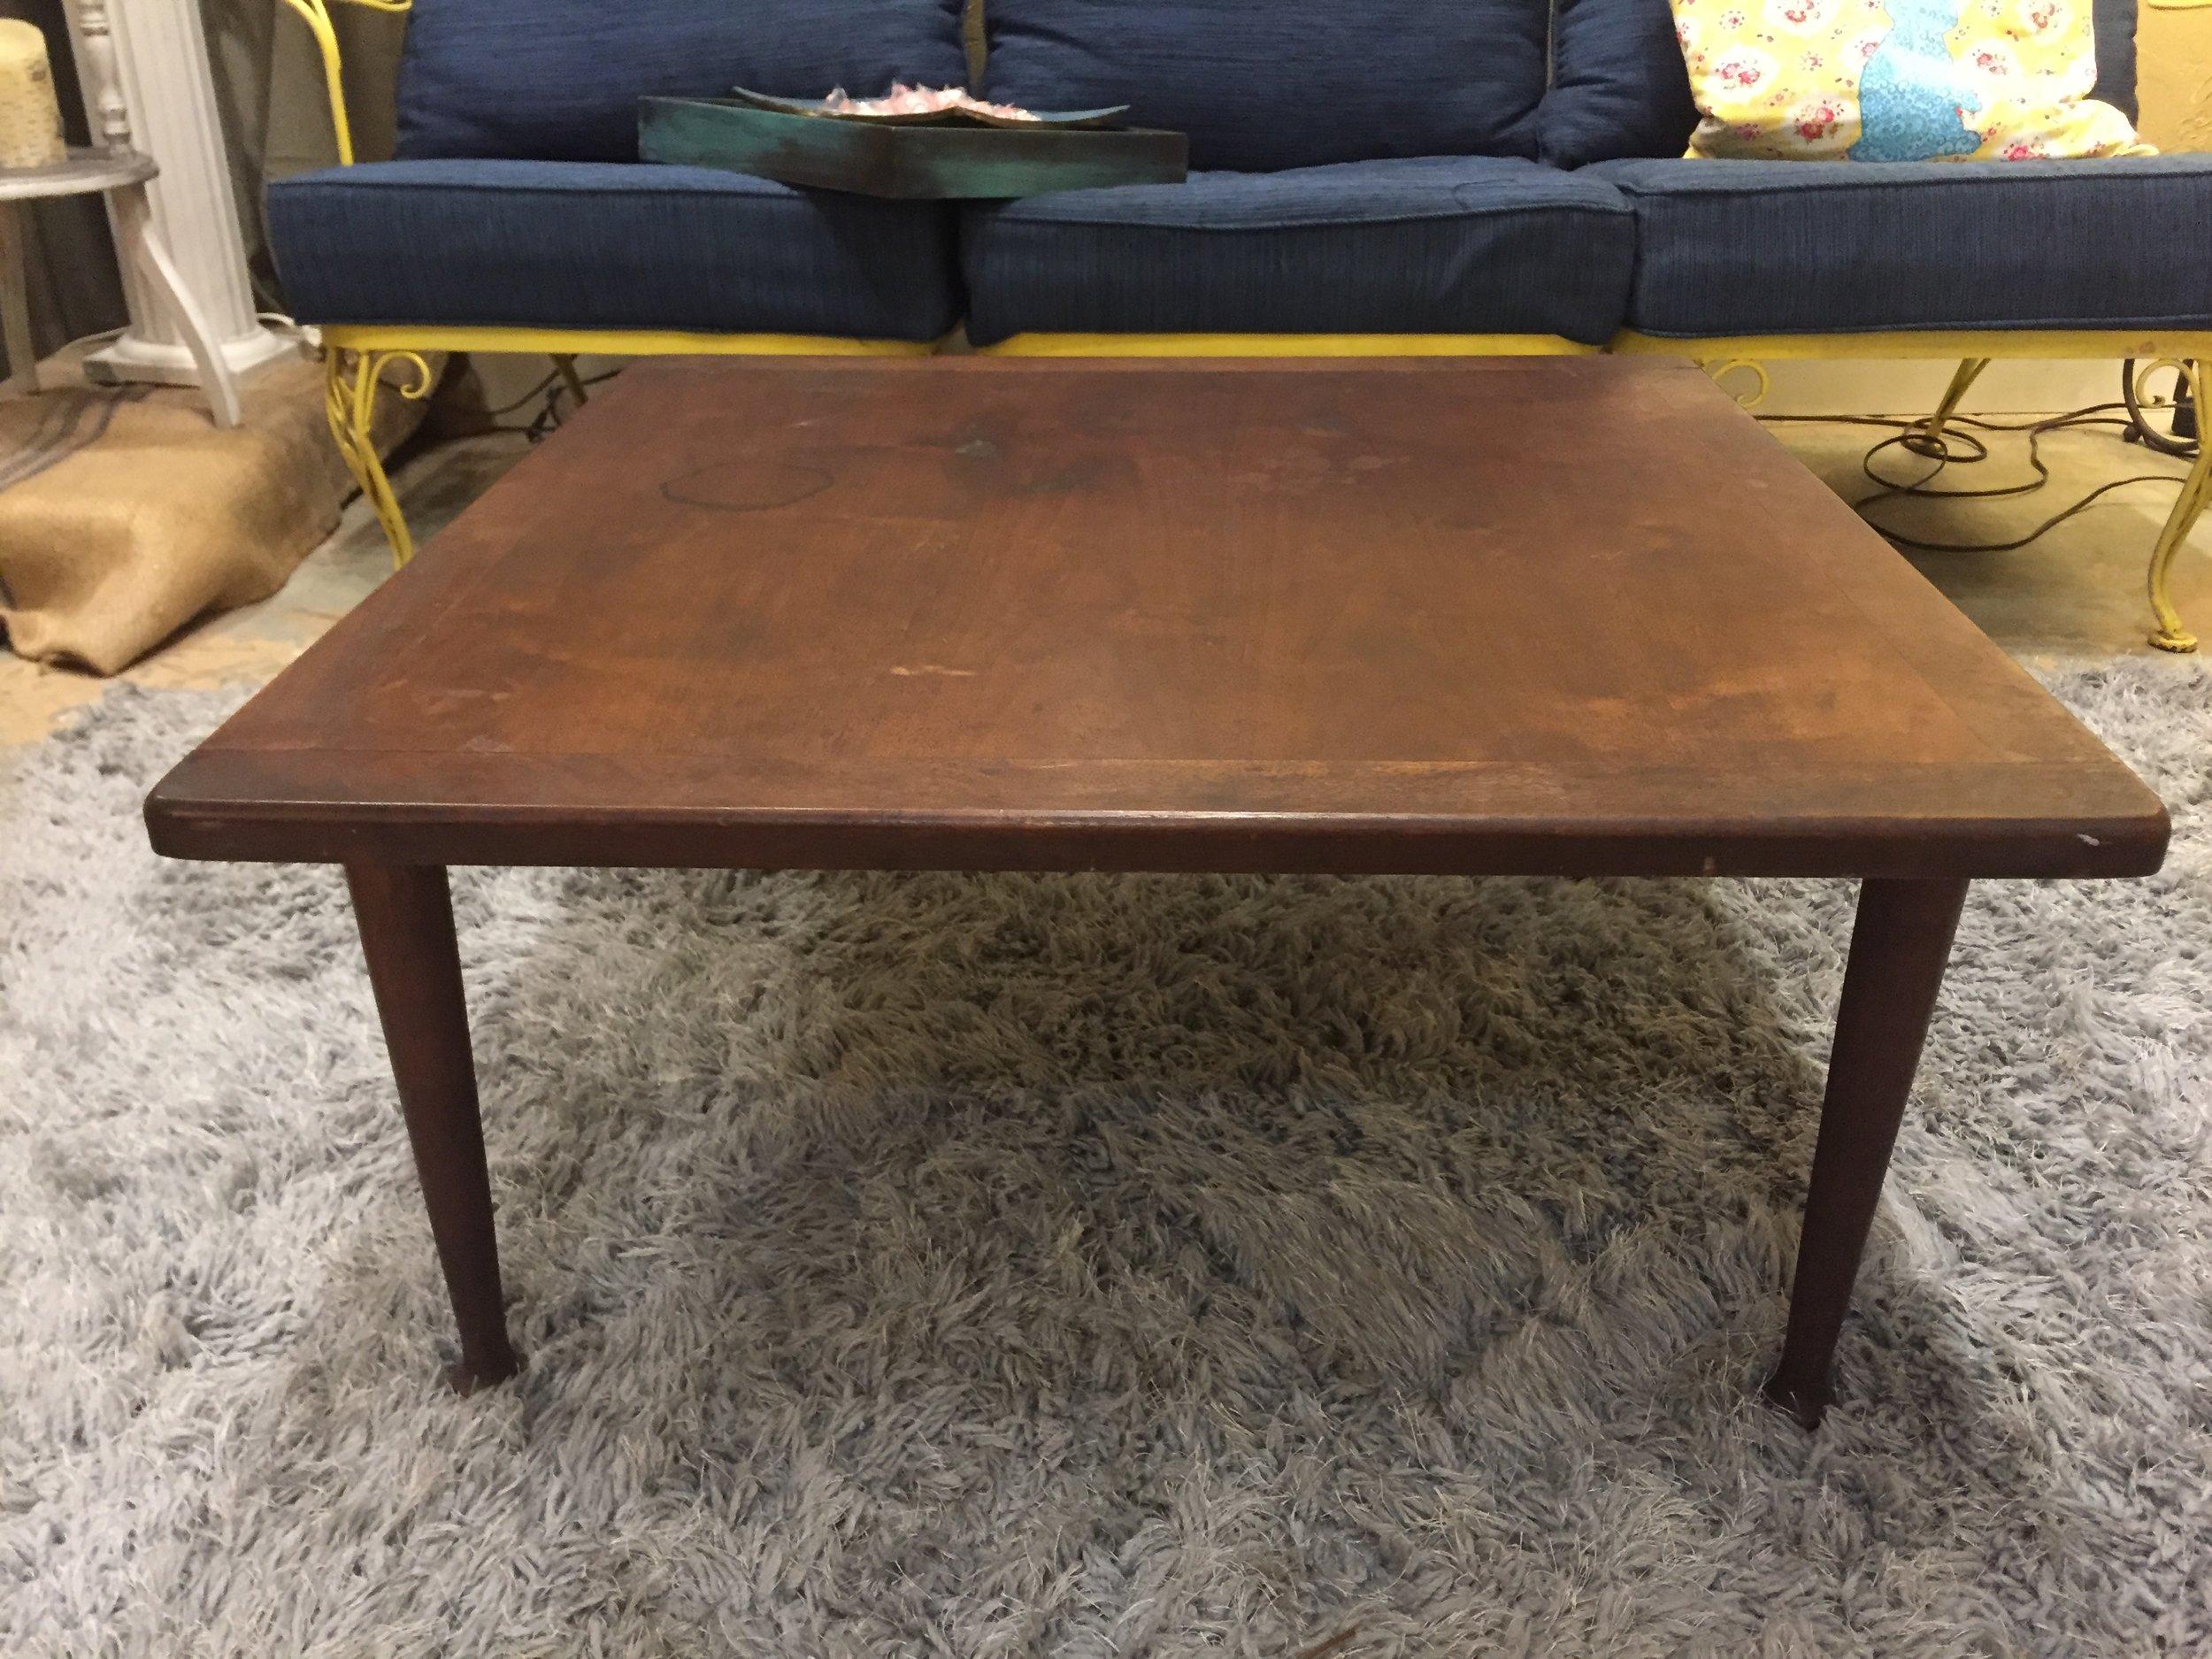 SOLD! Dark Wood Coffee Table $29.95 - C0913 21964